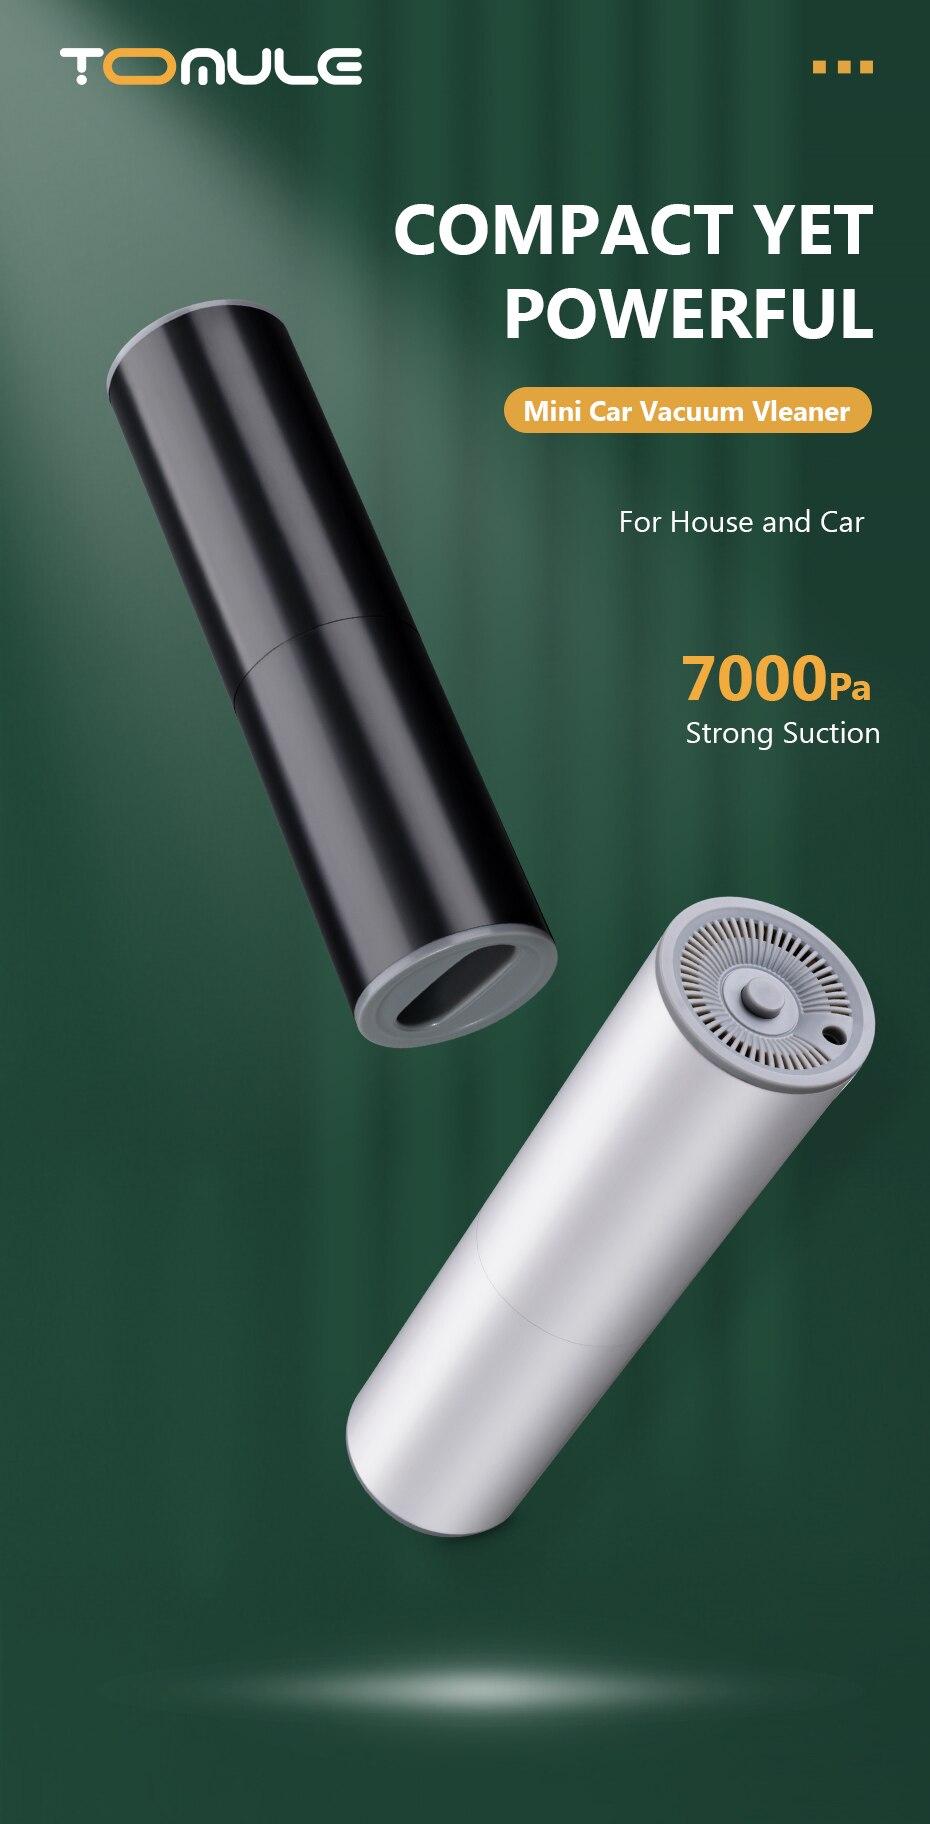 Aspirapolvere portatile senza fili per auto